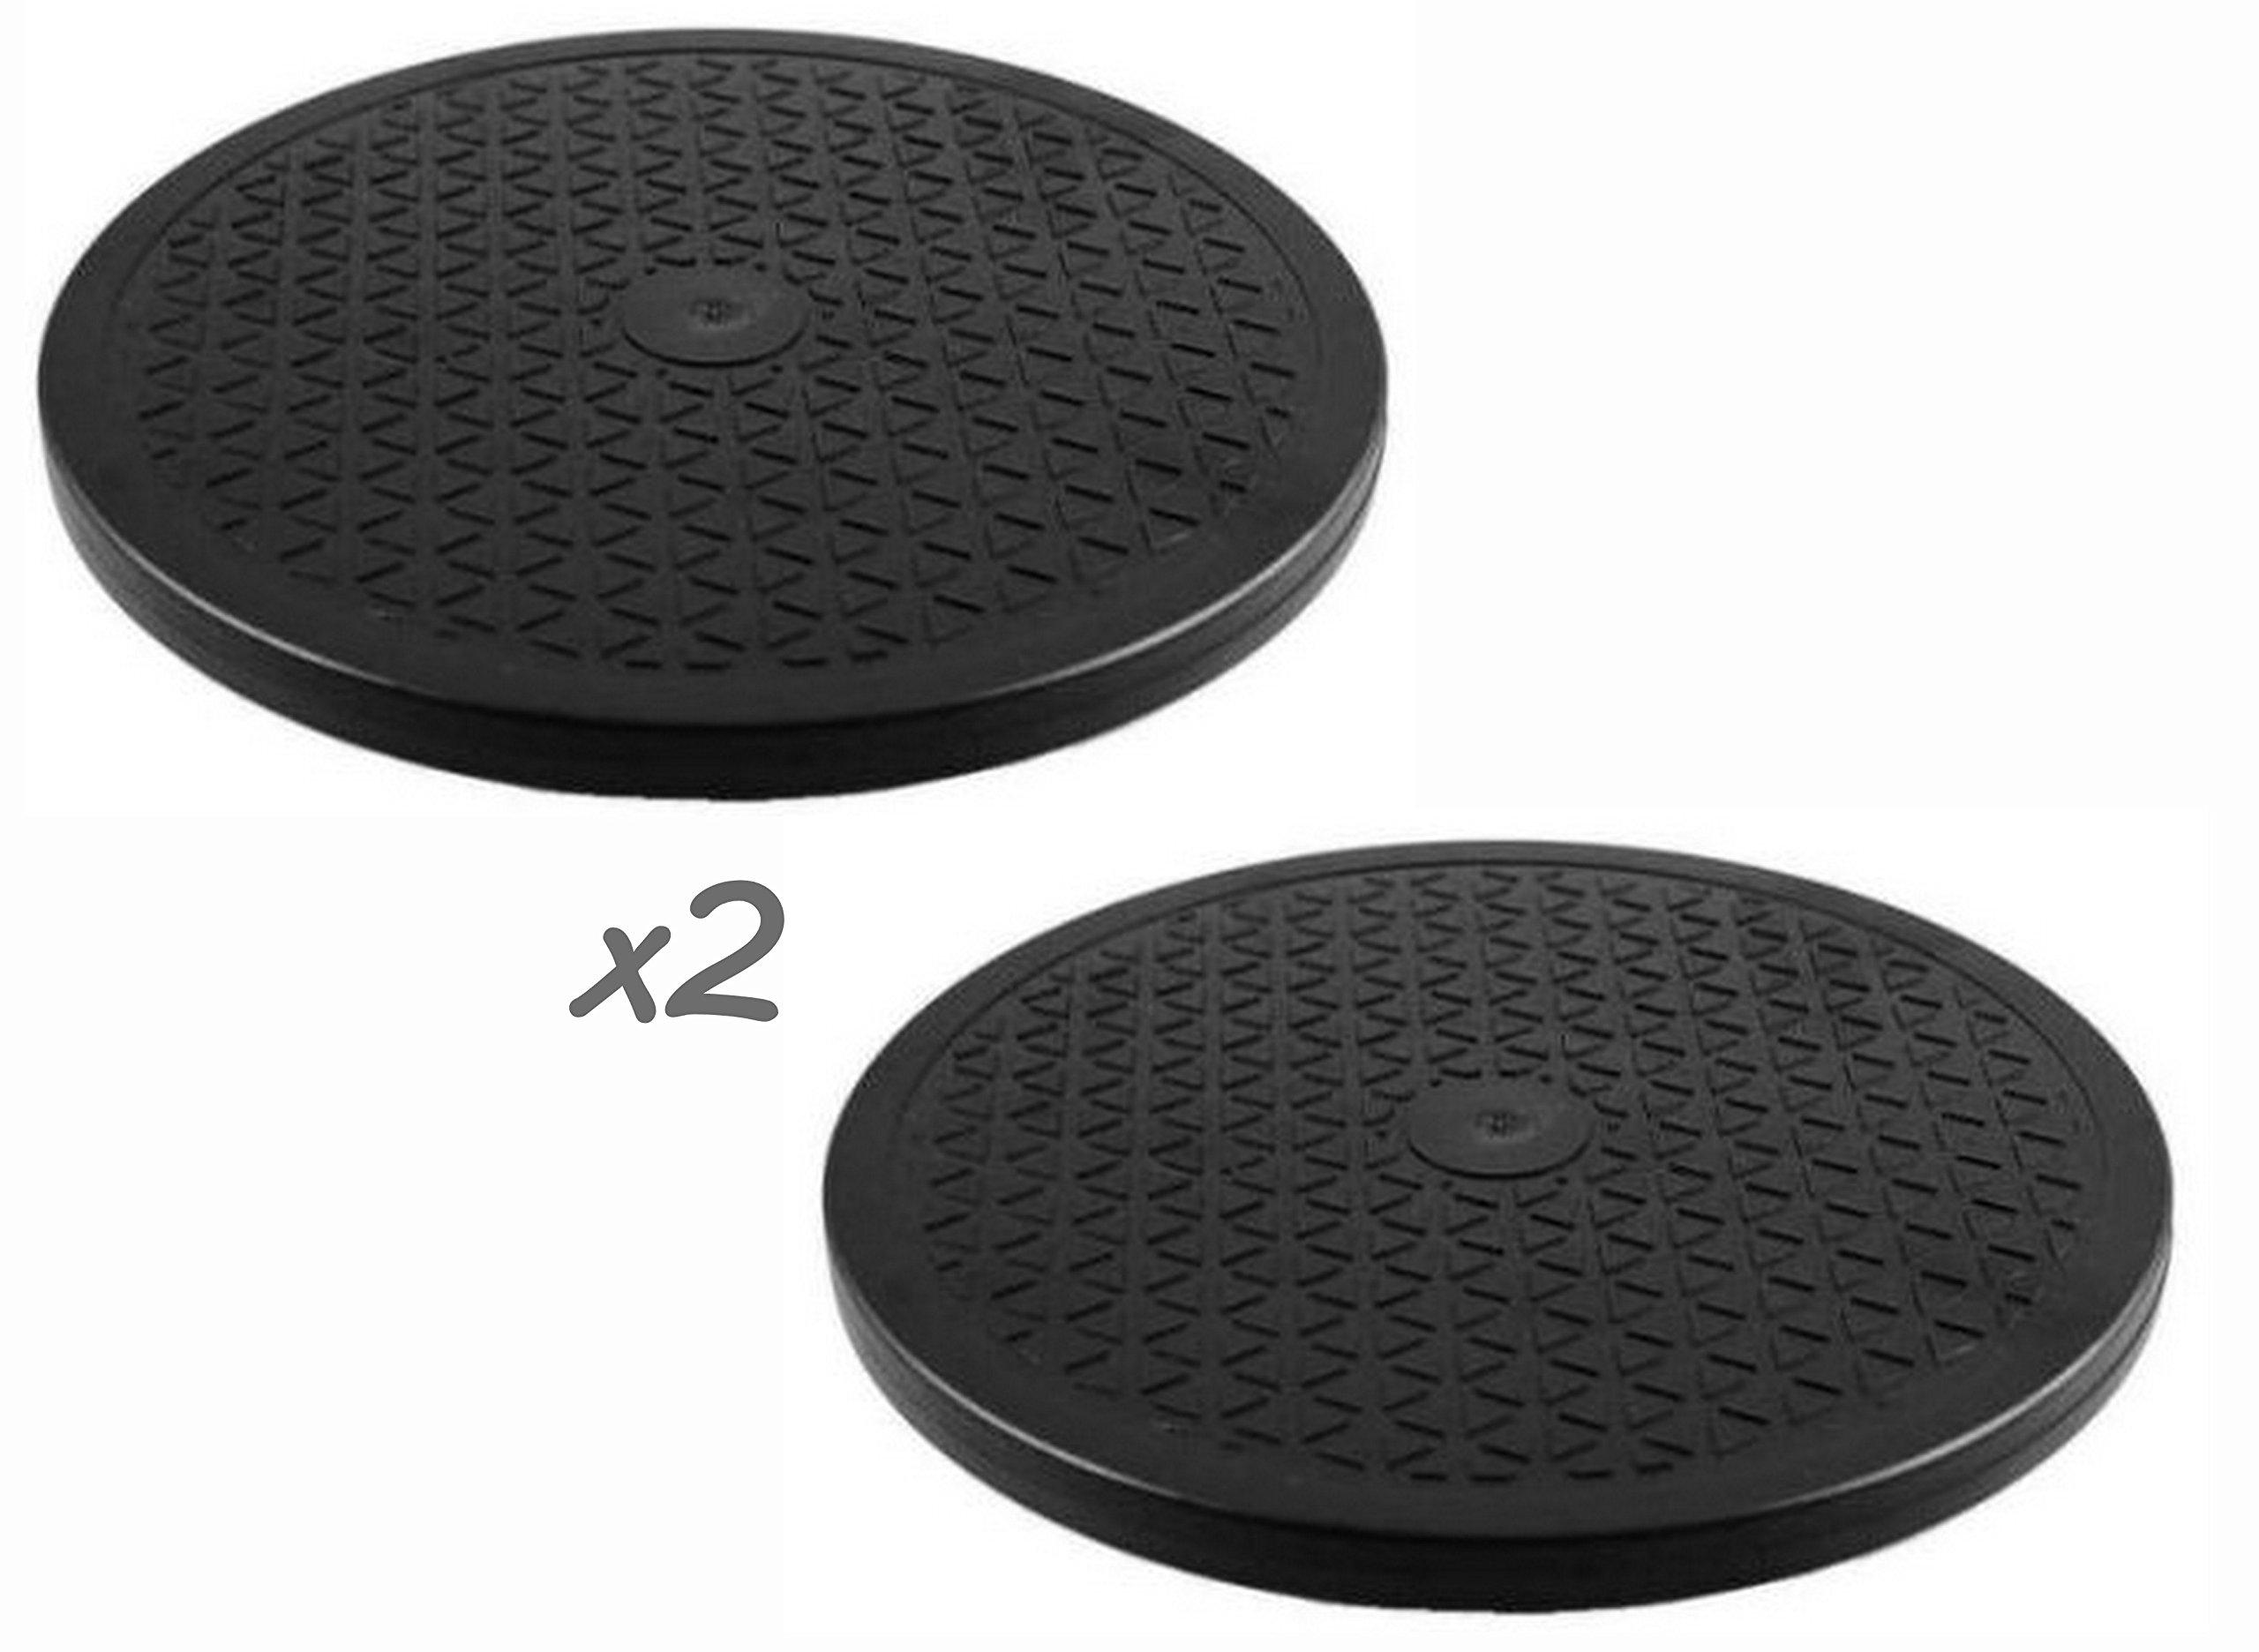 ALAZCO 2 Lazy Susans - 10'' Rotating Turntable - Each 65 Lbs Capacity